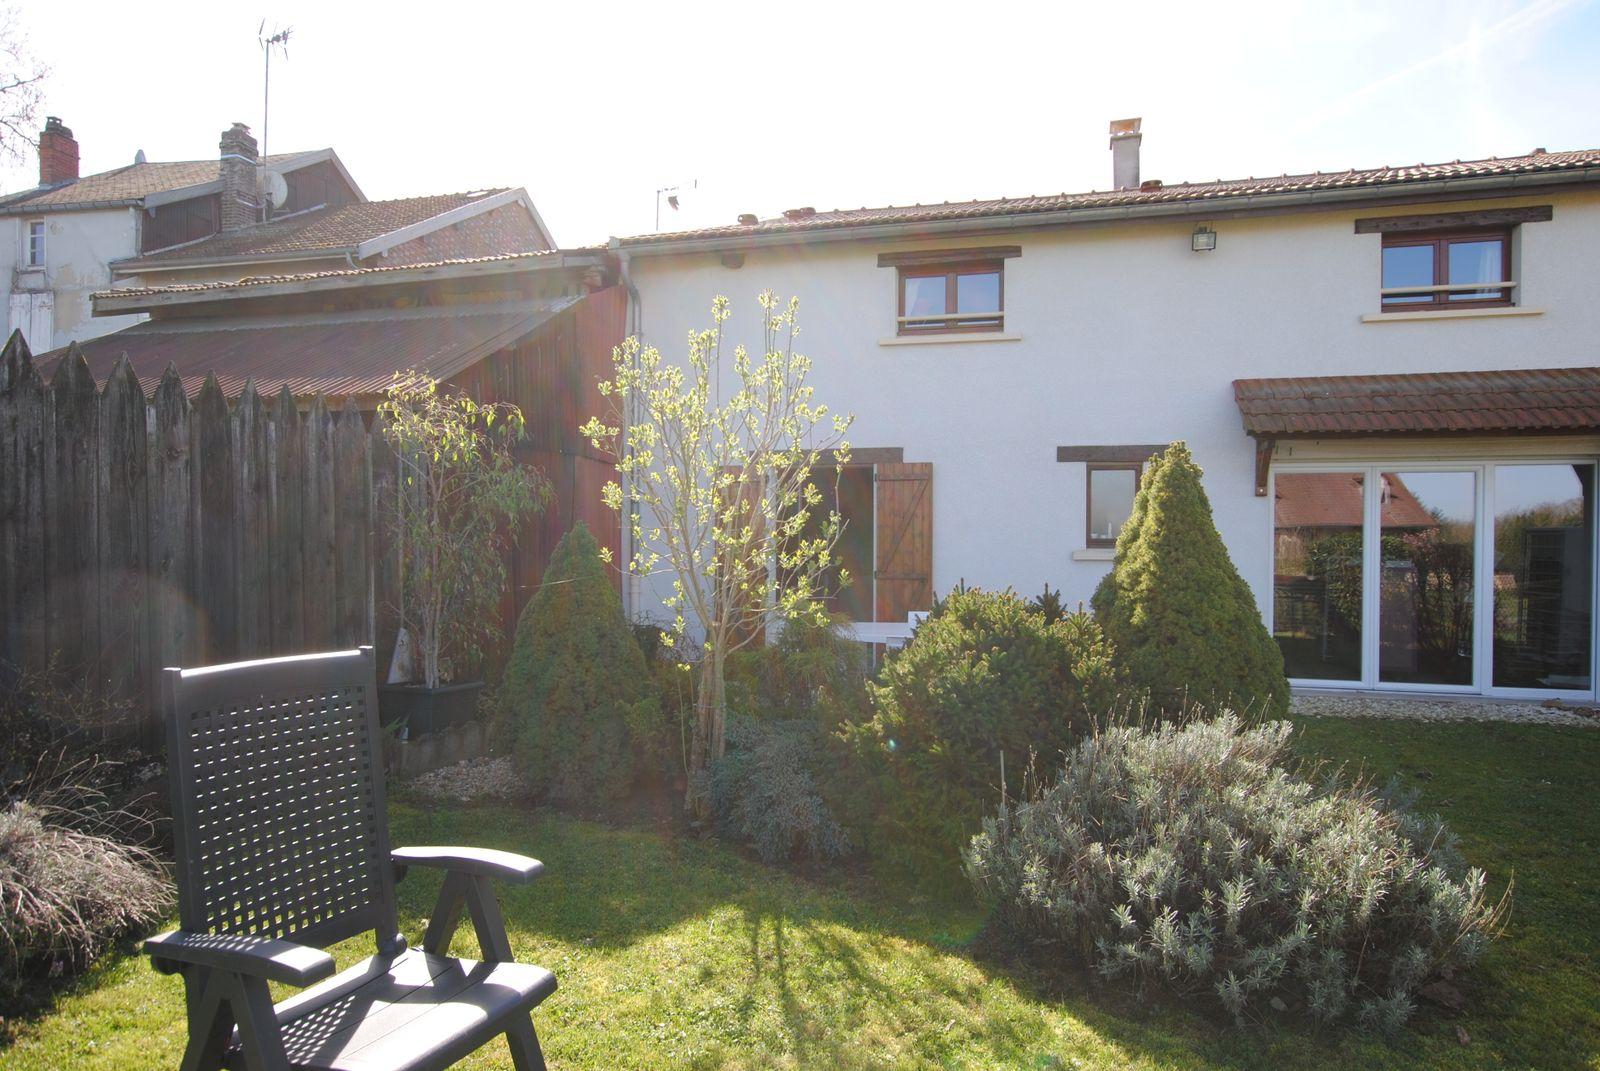 Jardin (vue sur terrasse) 51G491 - Les Pom's - Givry en Argonne - Gîtes de France Marne